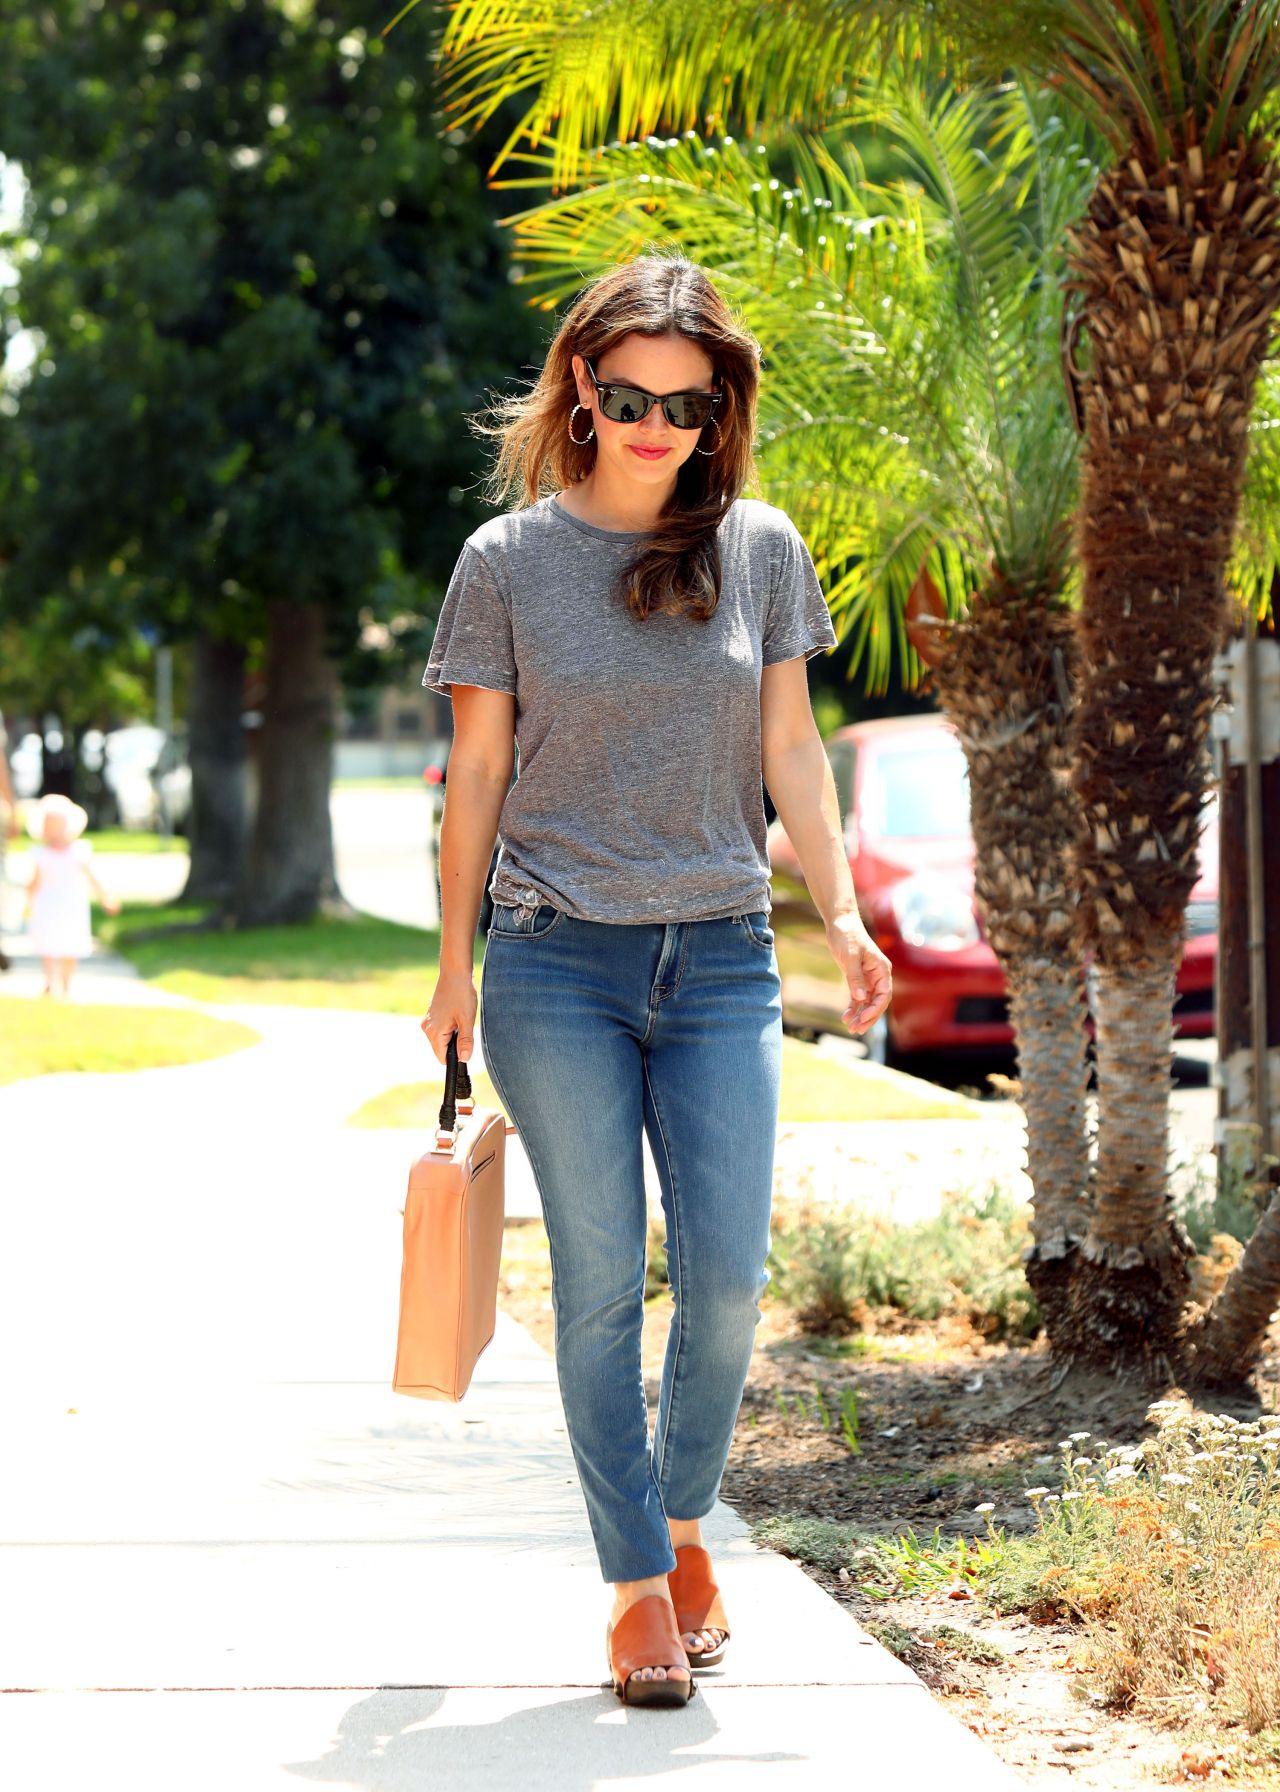 Rachel Bilson Strolling In Beverly Hills 07 31 2017